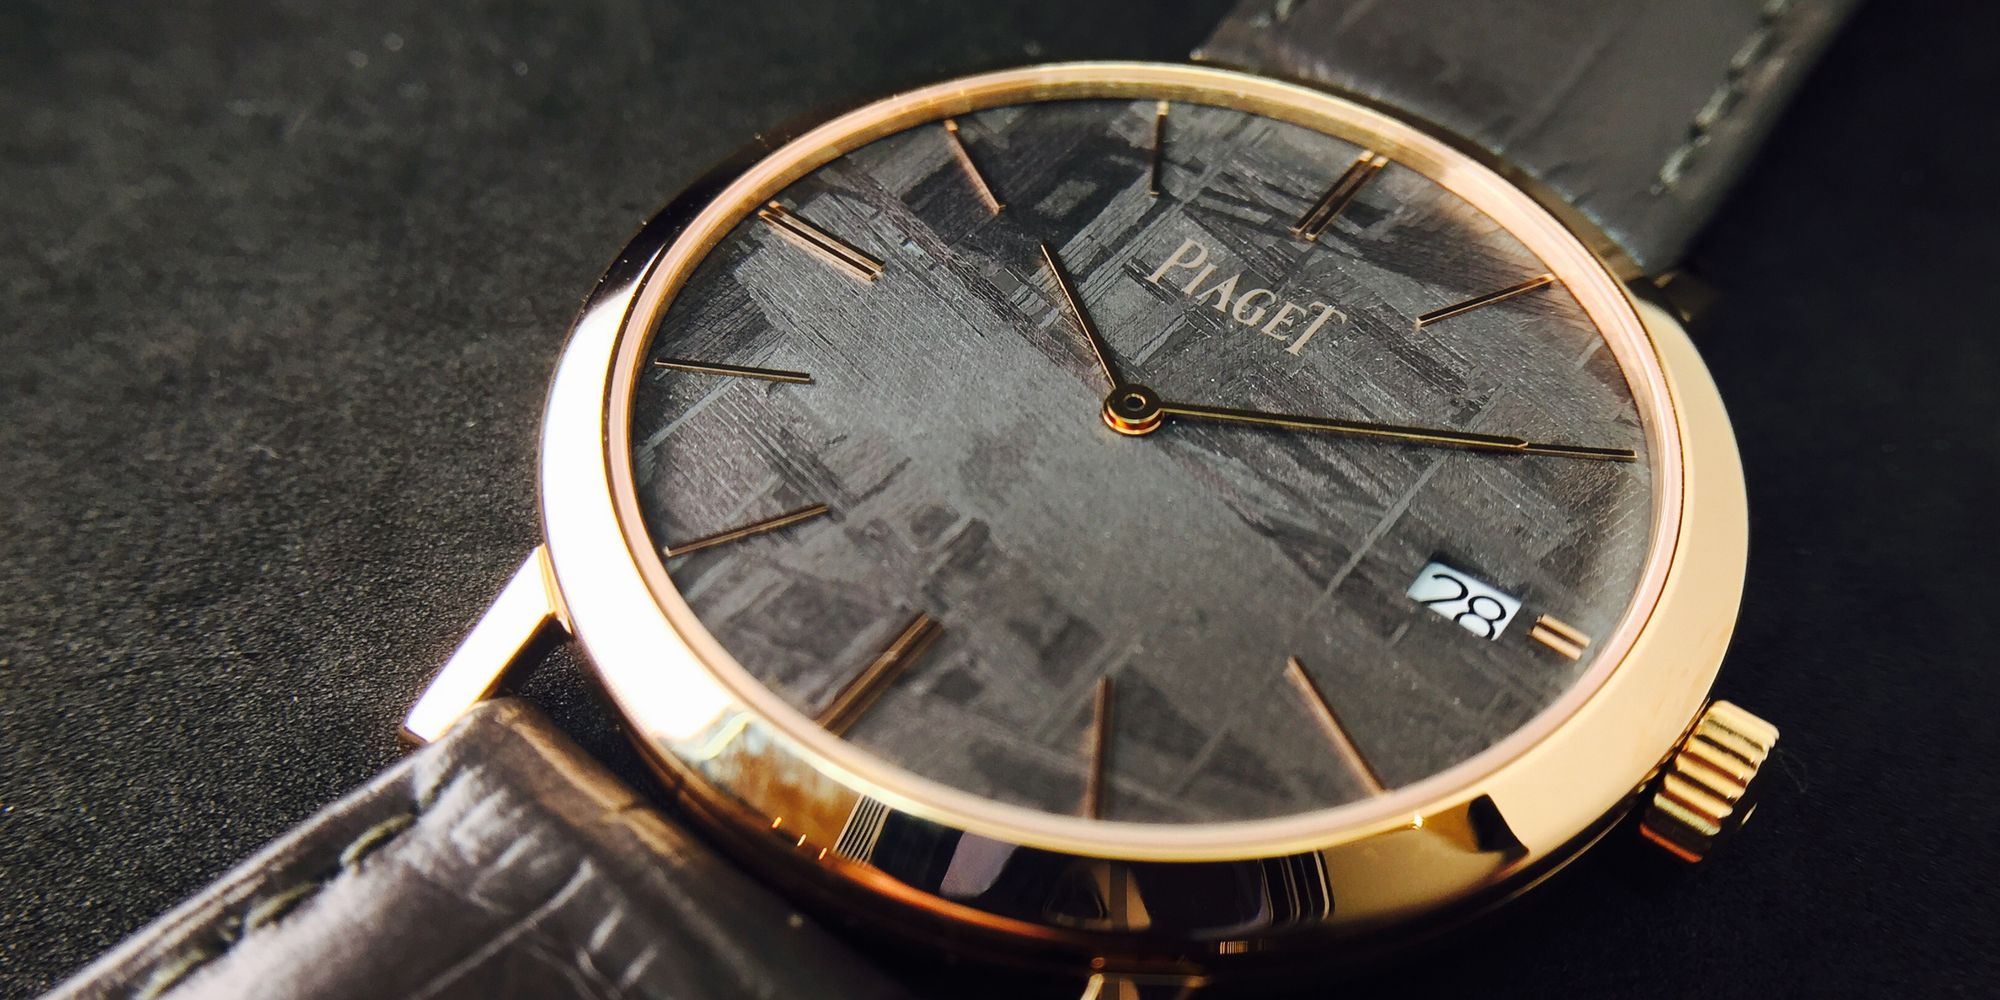 【Pre-SIHH 2019】以星空點綴製錶精髓:伯爵發表三款全新Altiplano腕錶